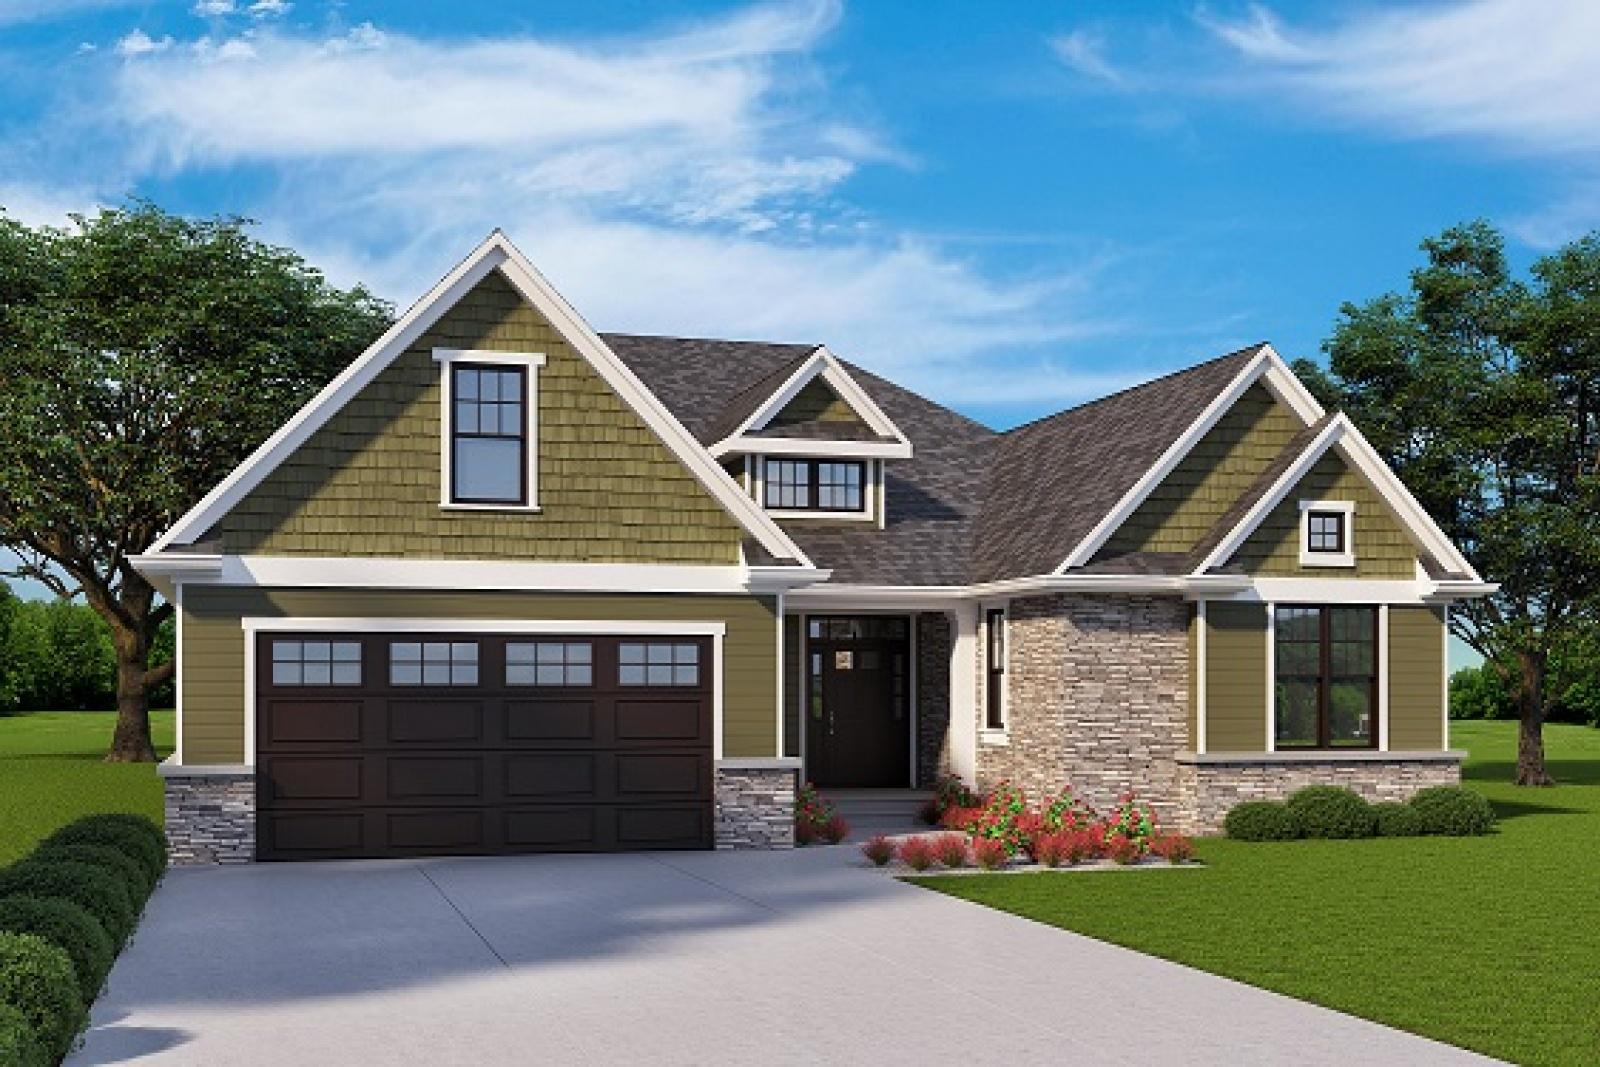 2159 Mackenna Drive, Graham, North Carolina 27253, 3 Bedrooms Bedrooms, 8 Rooms Rooms,2 BathroomsBathrooms,Shamrock Valley Townhomes,For Sale,Parker,Mackenna,2,1053